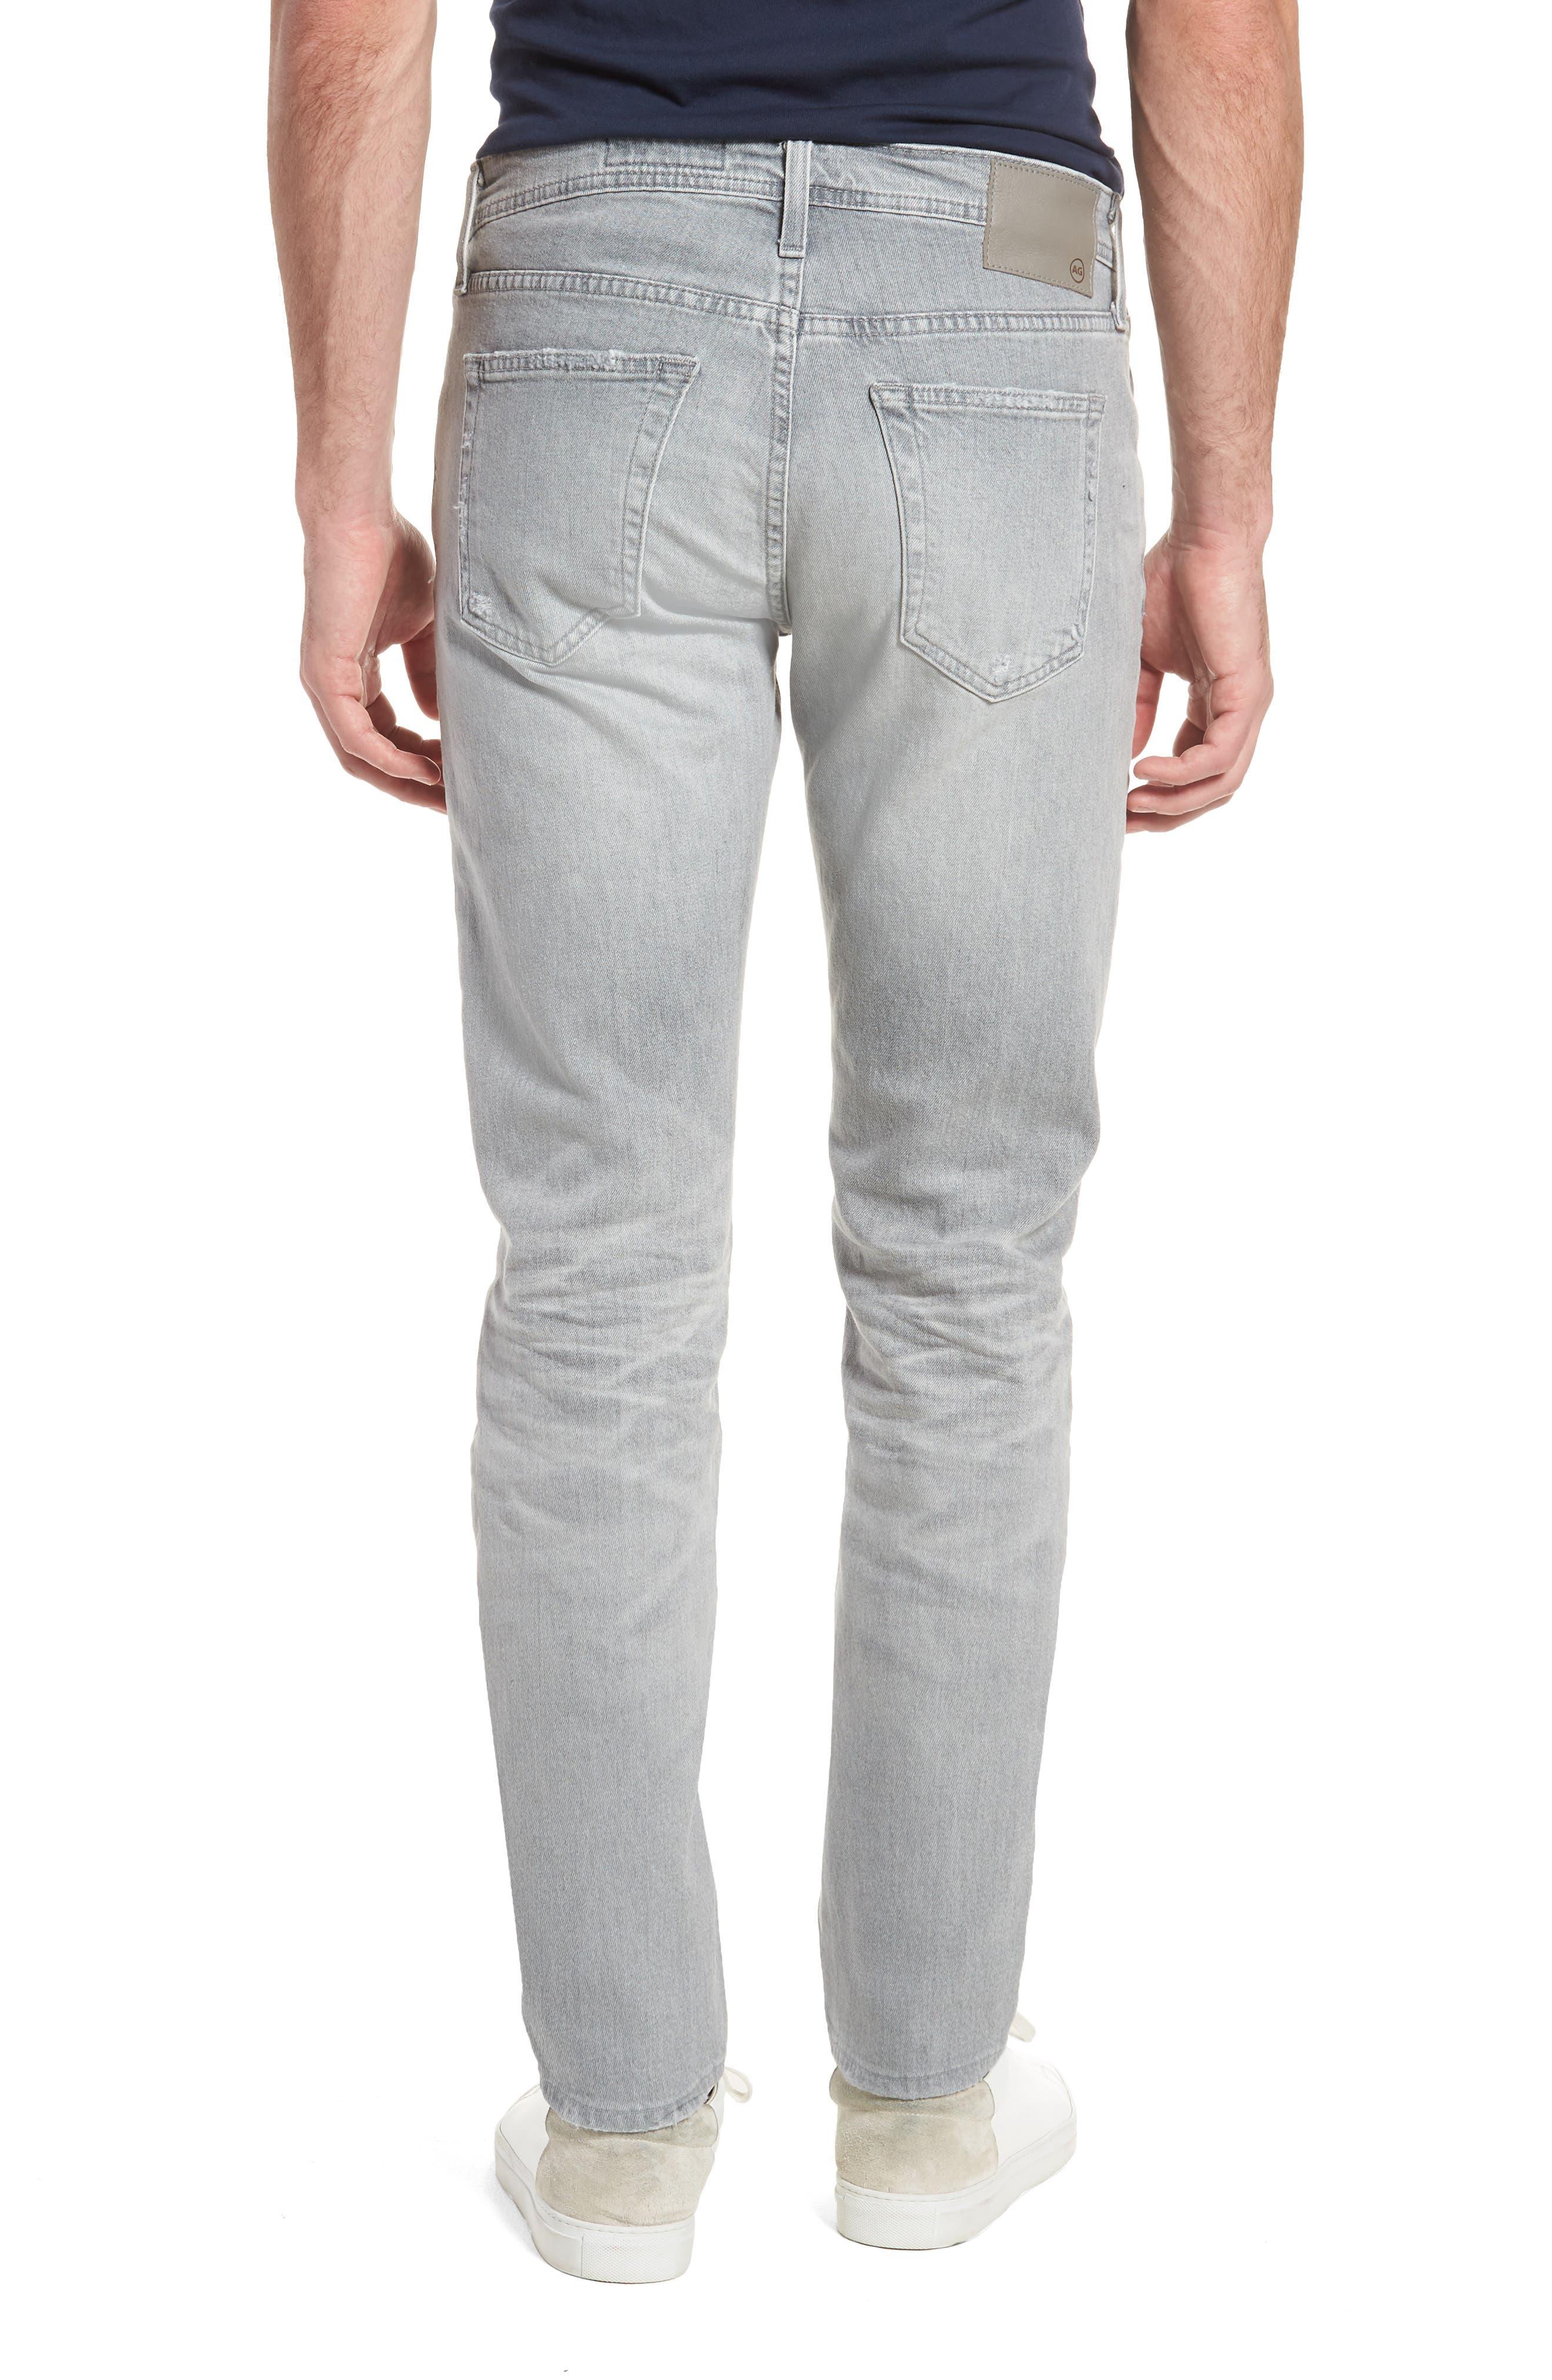 Tellis Slim Fit Jeans,                             Alternate thumbnail 2, color,                             21 Years Sketch